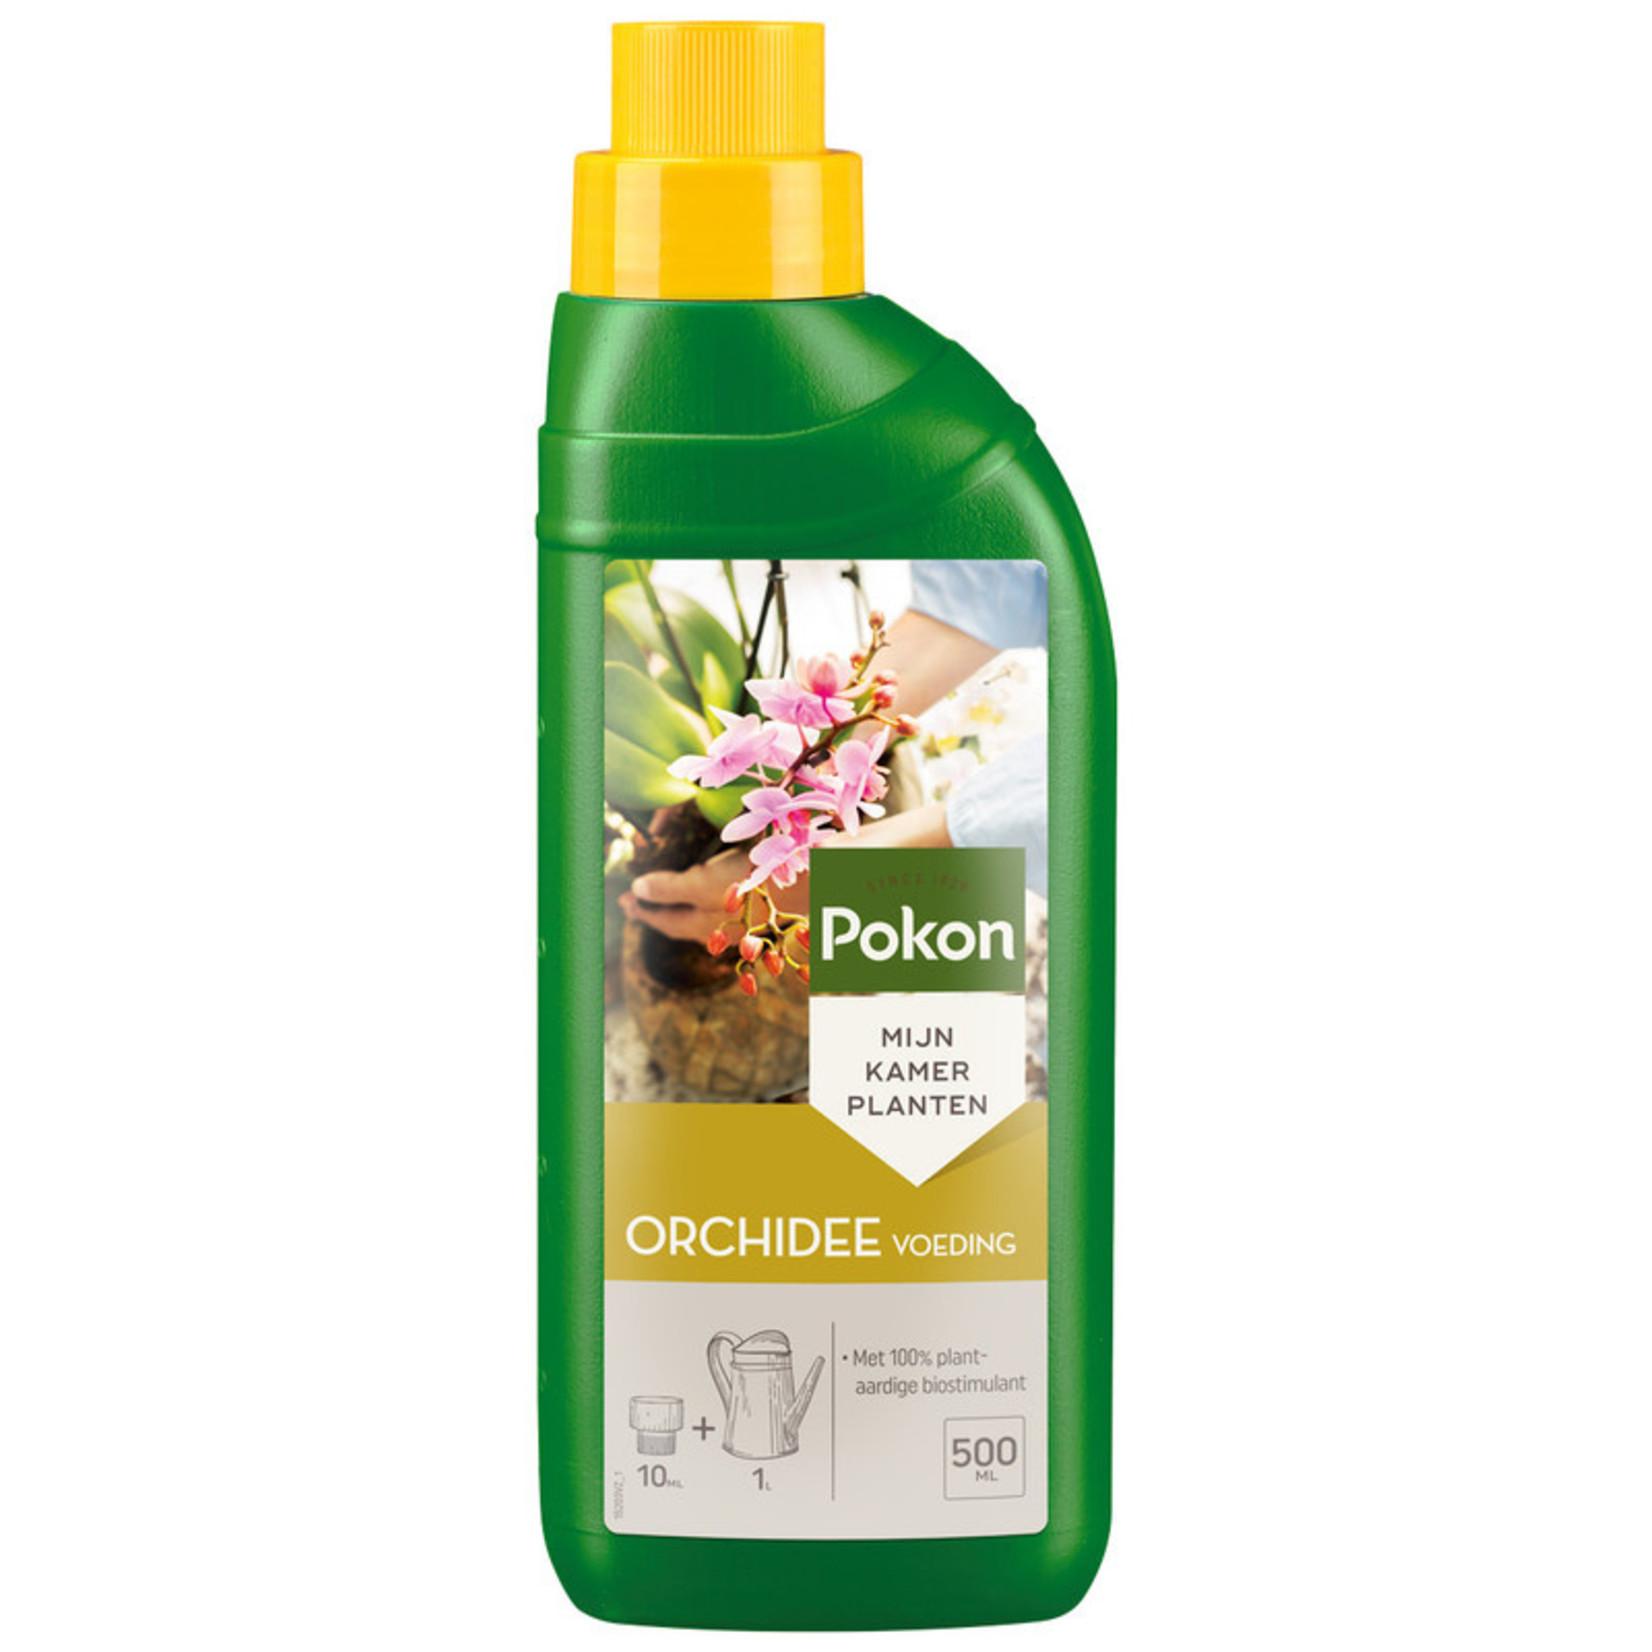 Pokon Orchidee voeding 500ml